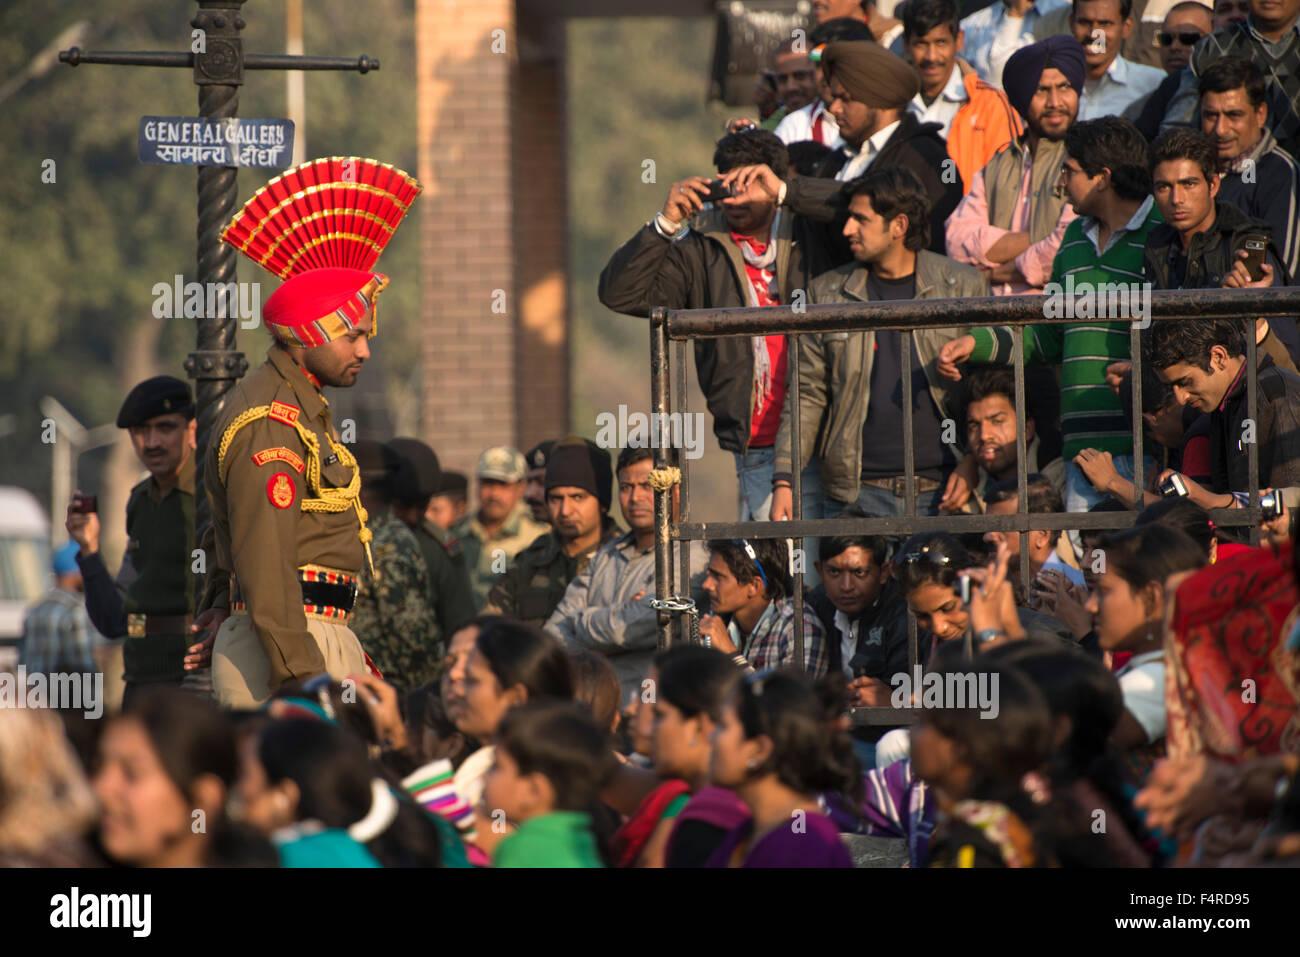 Asia, India, Punjab, Amritsar, Pakistani, border, ceremony, traditional, tradition, Wagah, soldier, crowd, nationalism, - Stock Image